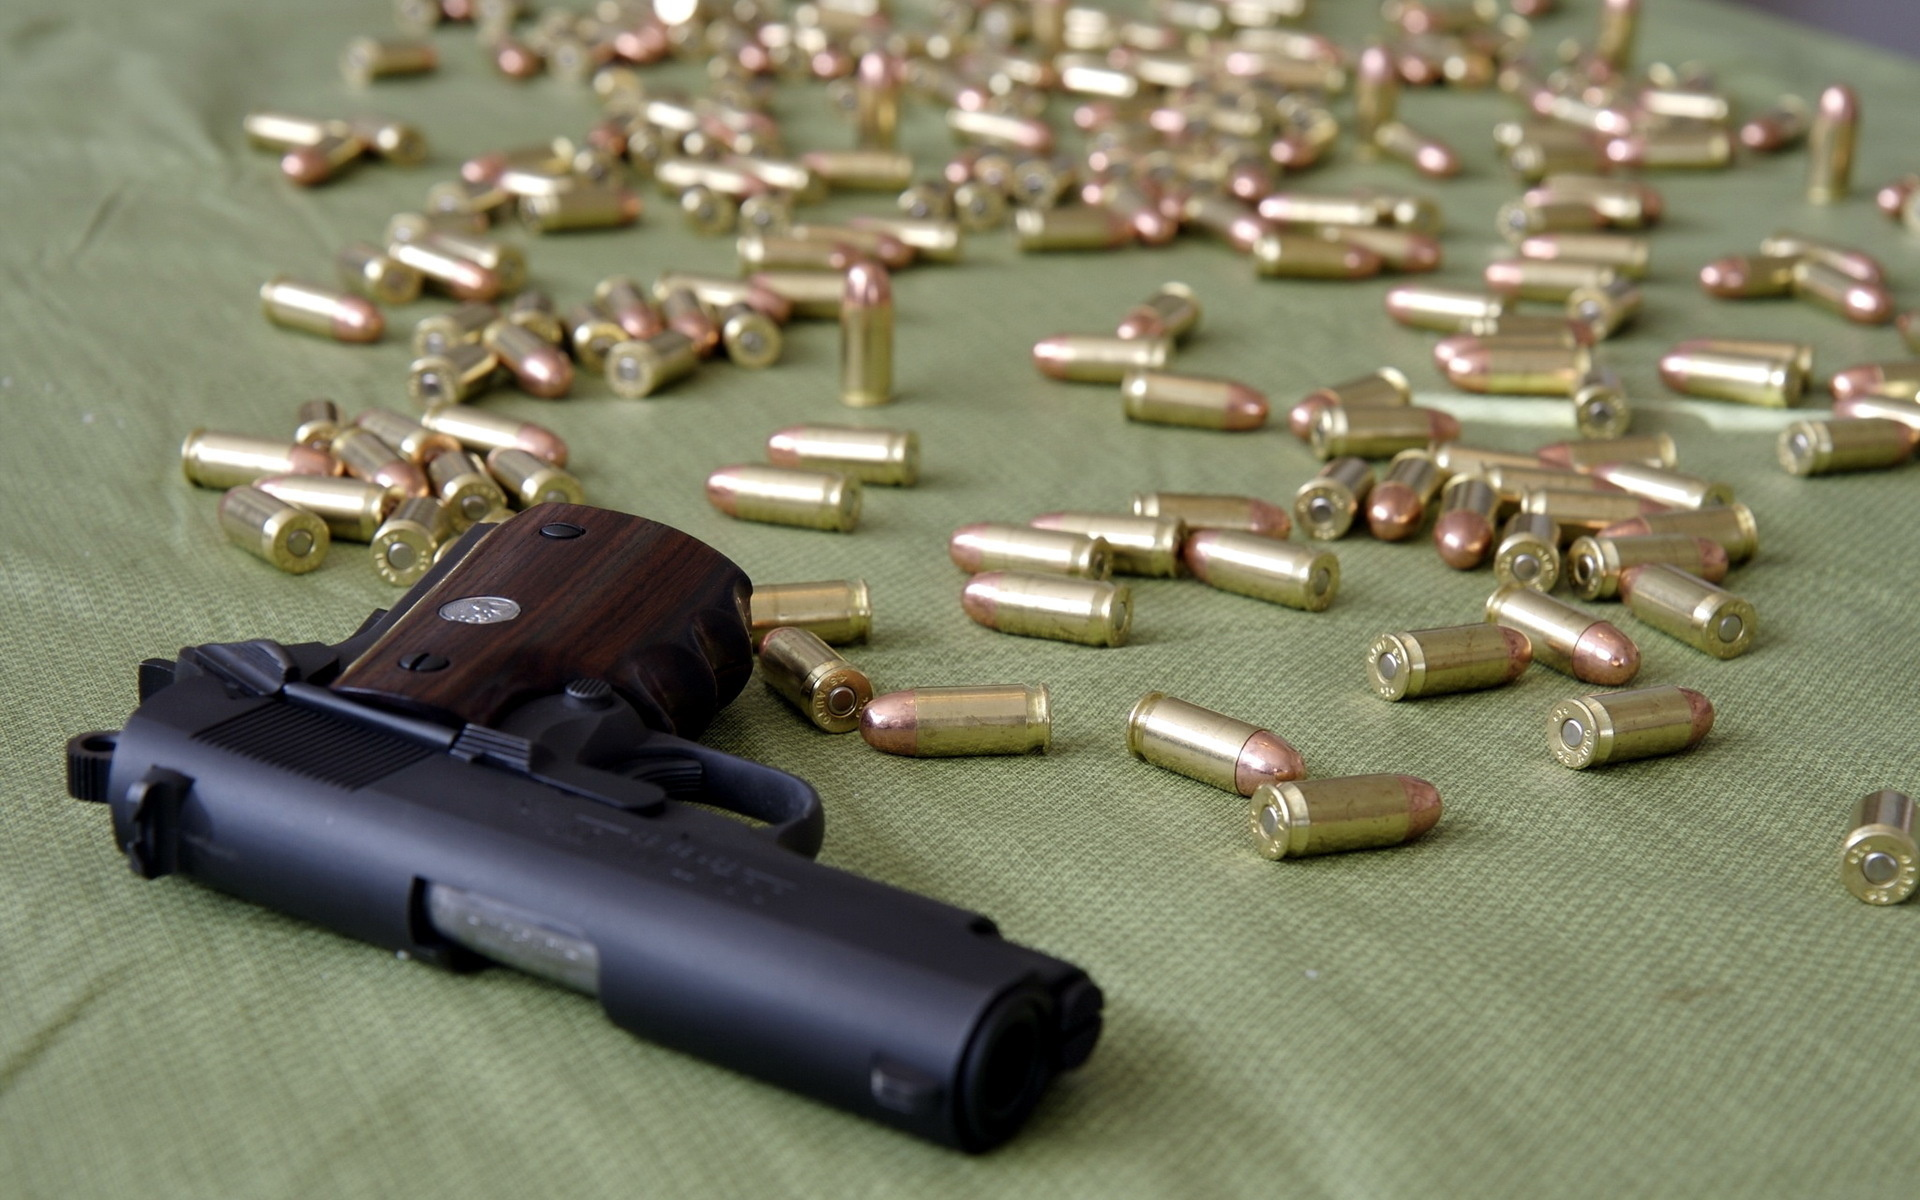 Weapons   Colt 1911 Wallpaper 1920x1200